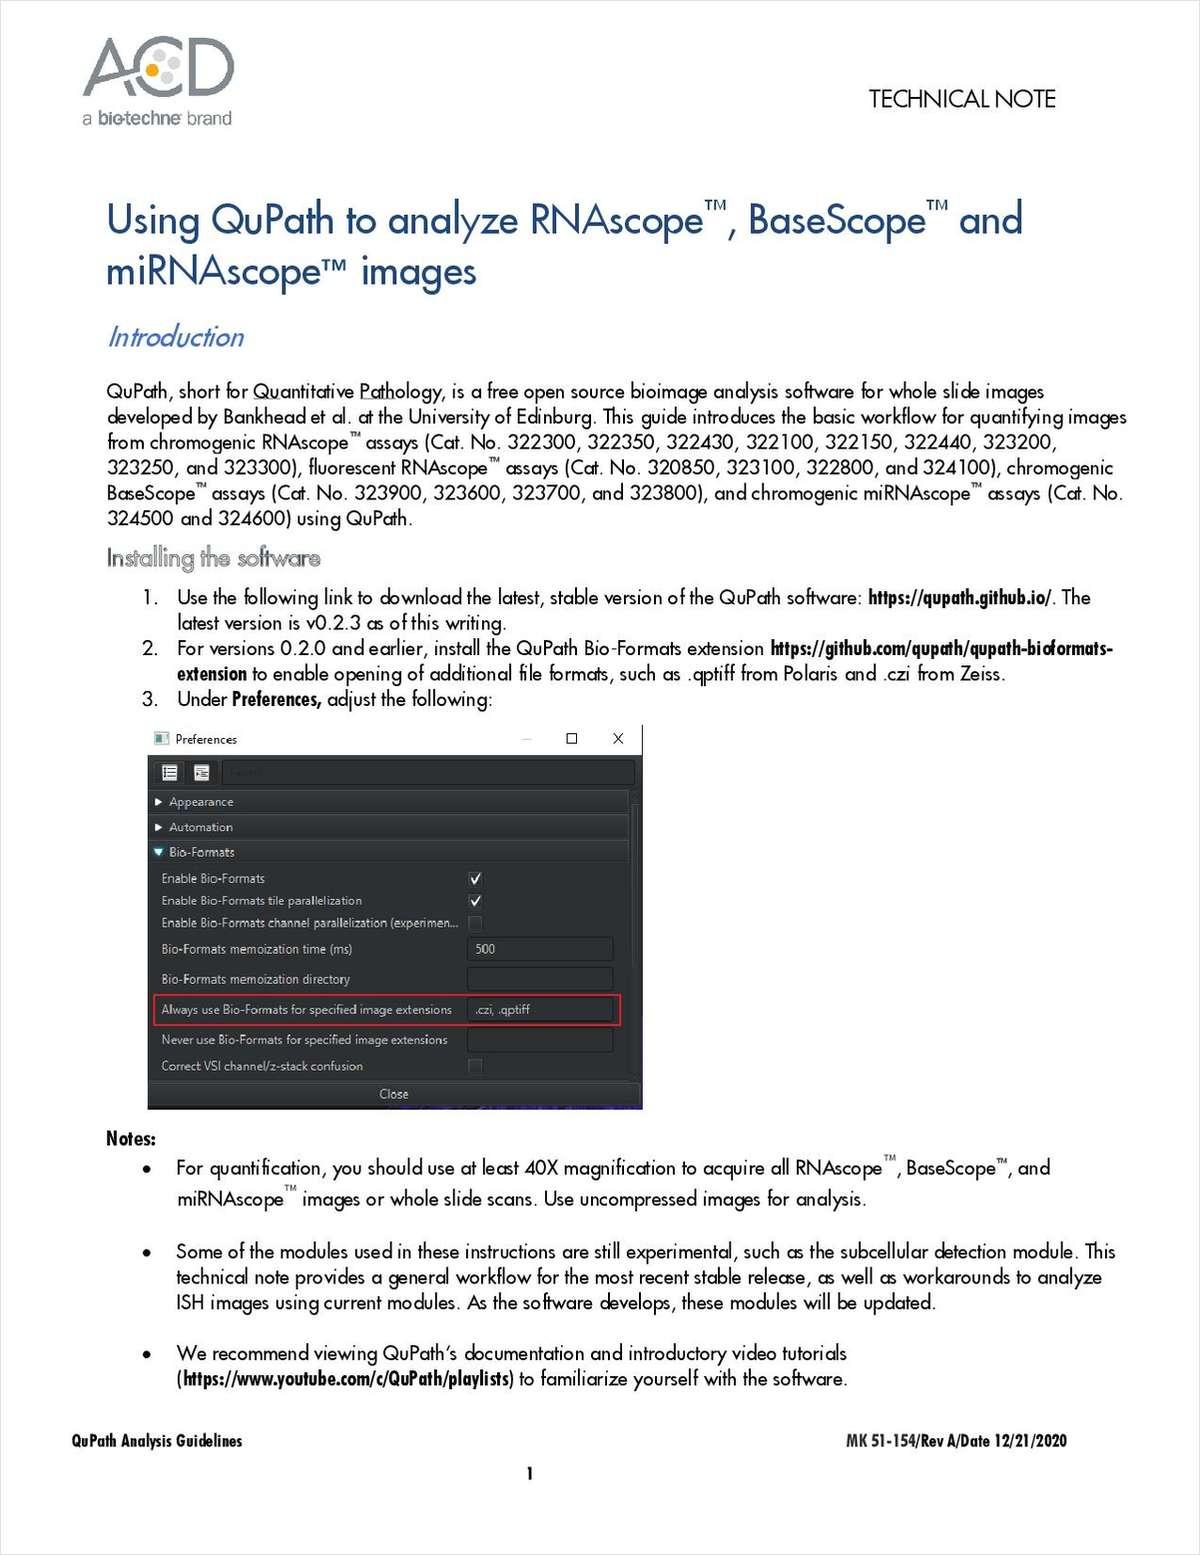 Using QuPath to analyze RNAscope, BaseScope and miRNAscope images